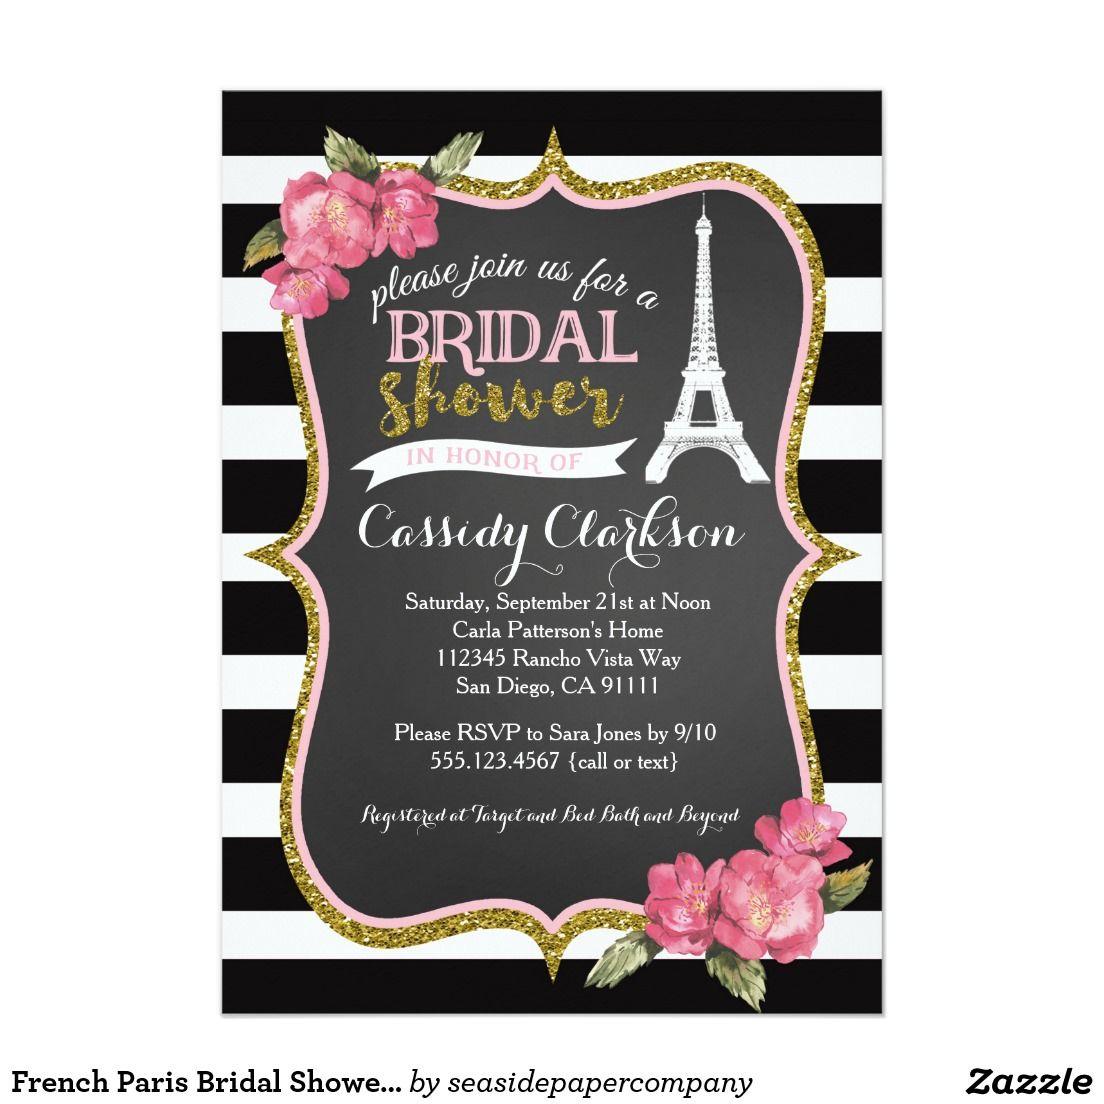 French Paris Bridal Shower invitation French Paris